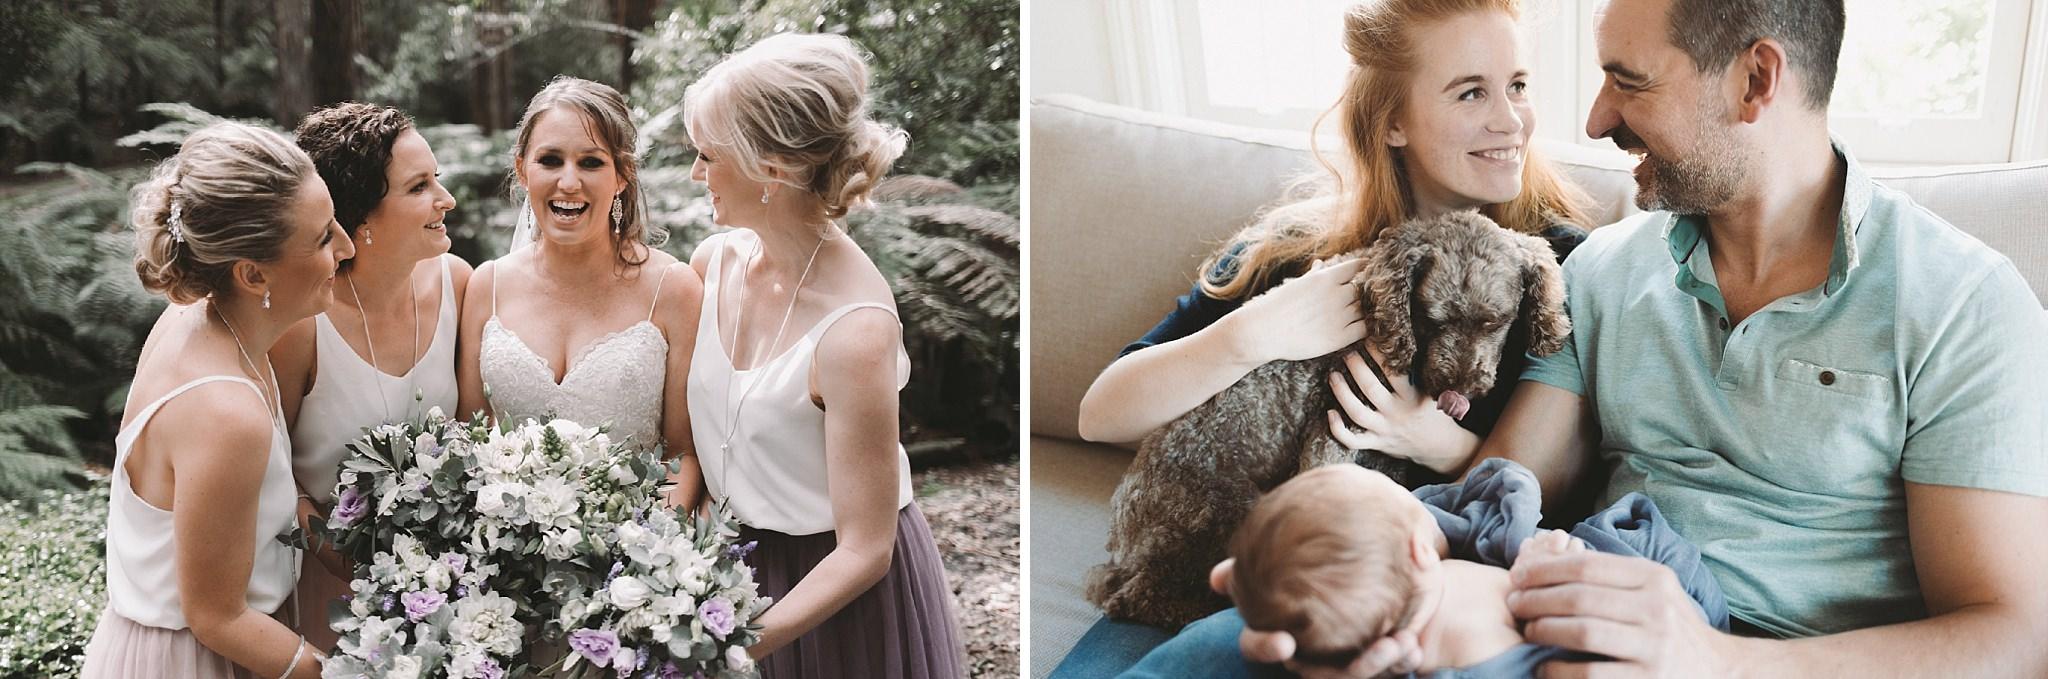 Lecinda Ward, Melbourne Family Newborn and Wedding Photographer_0012.jpg